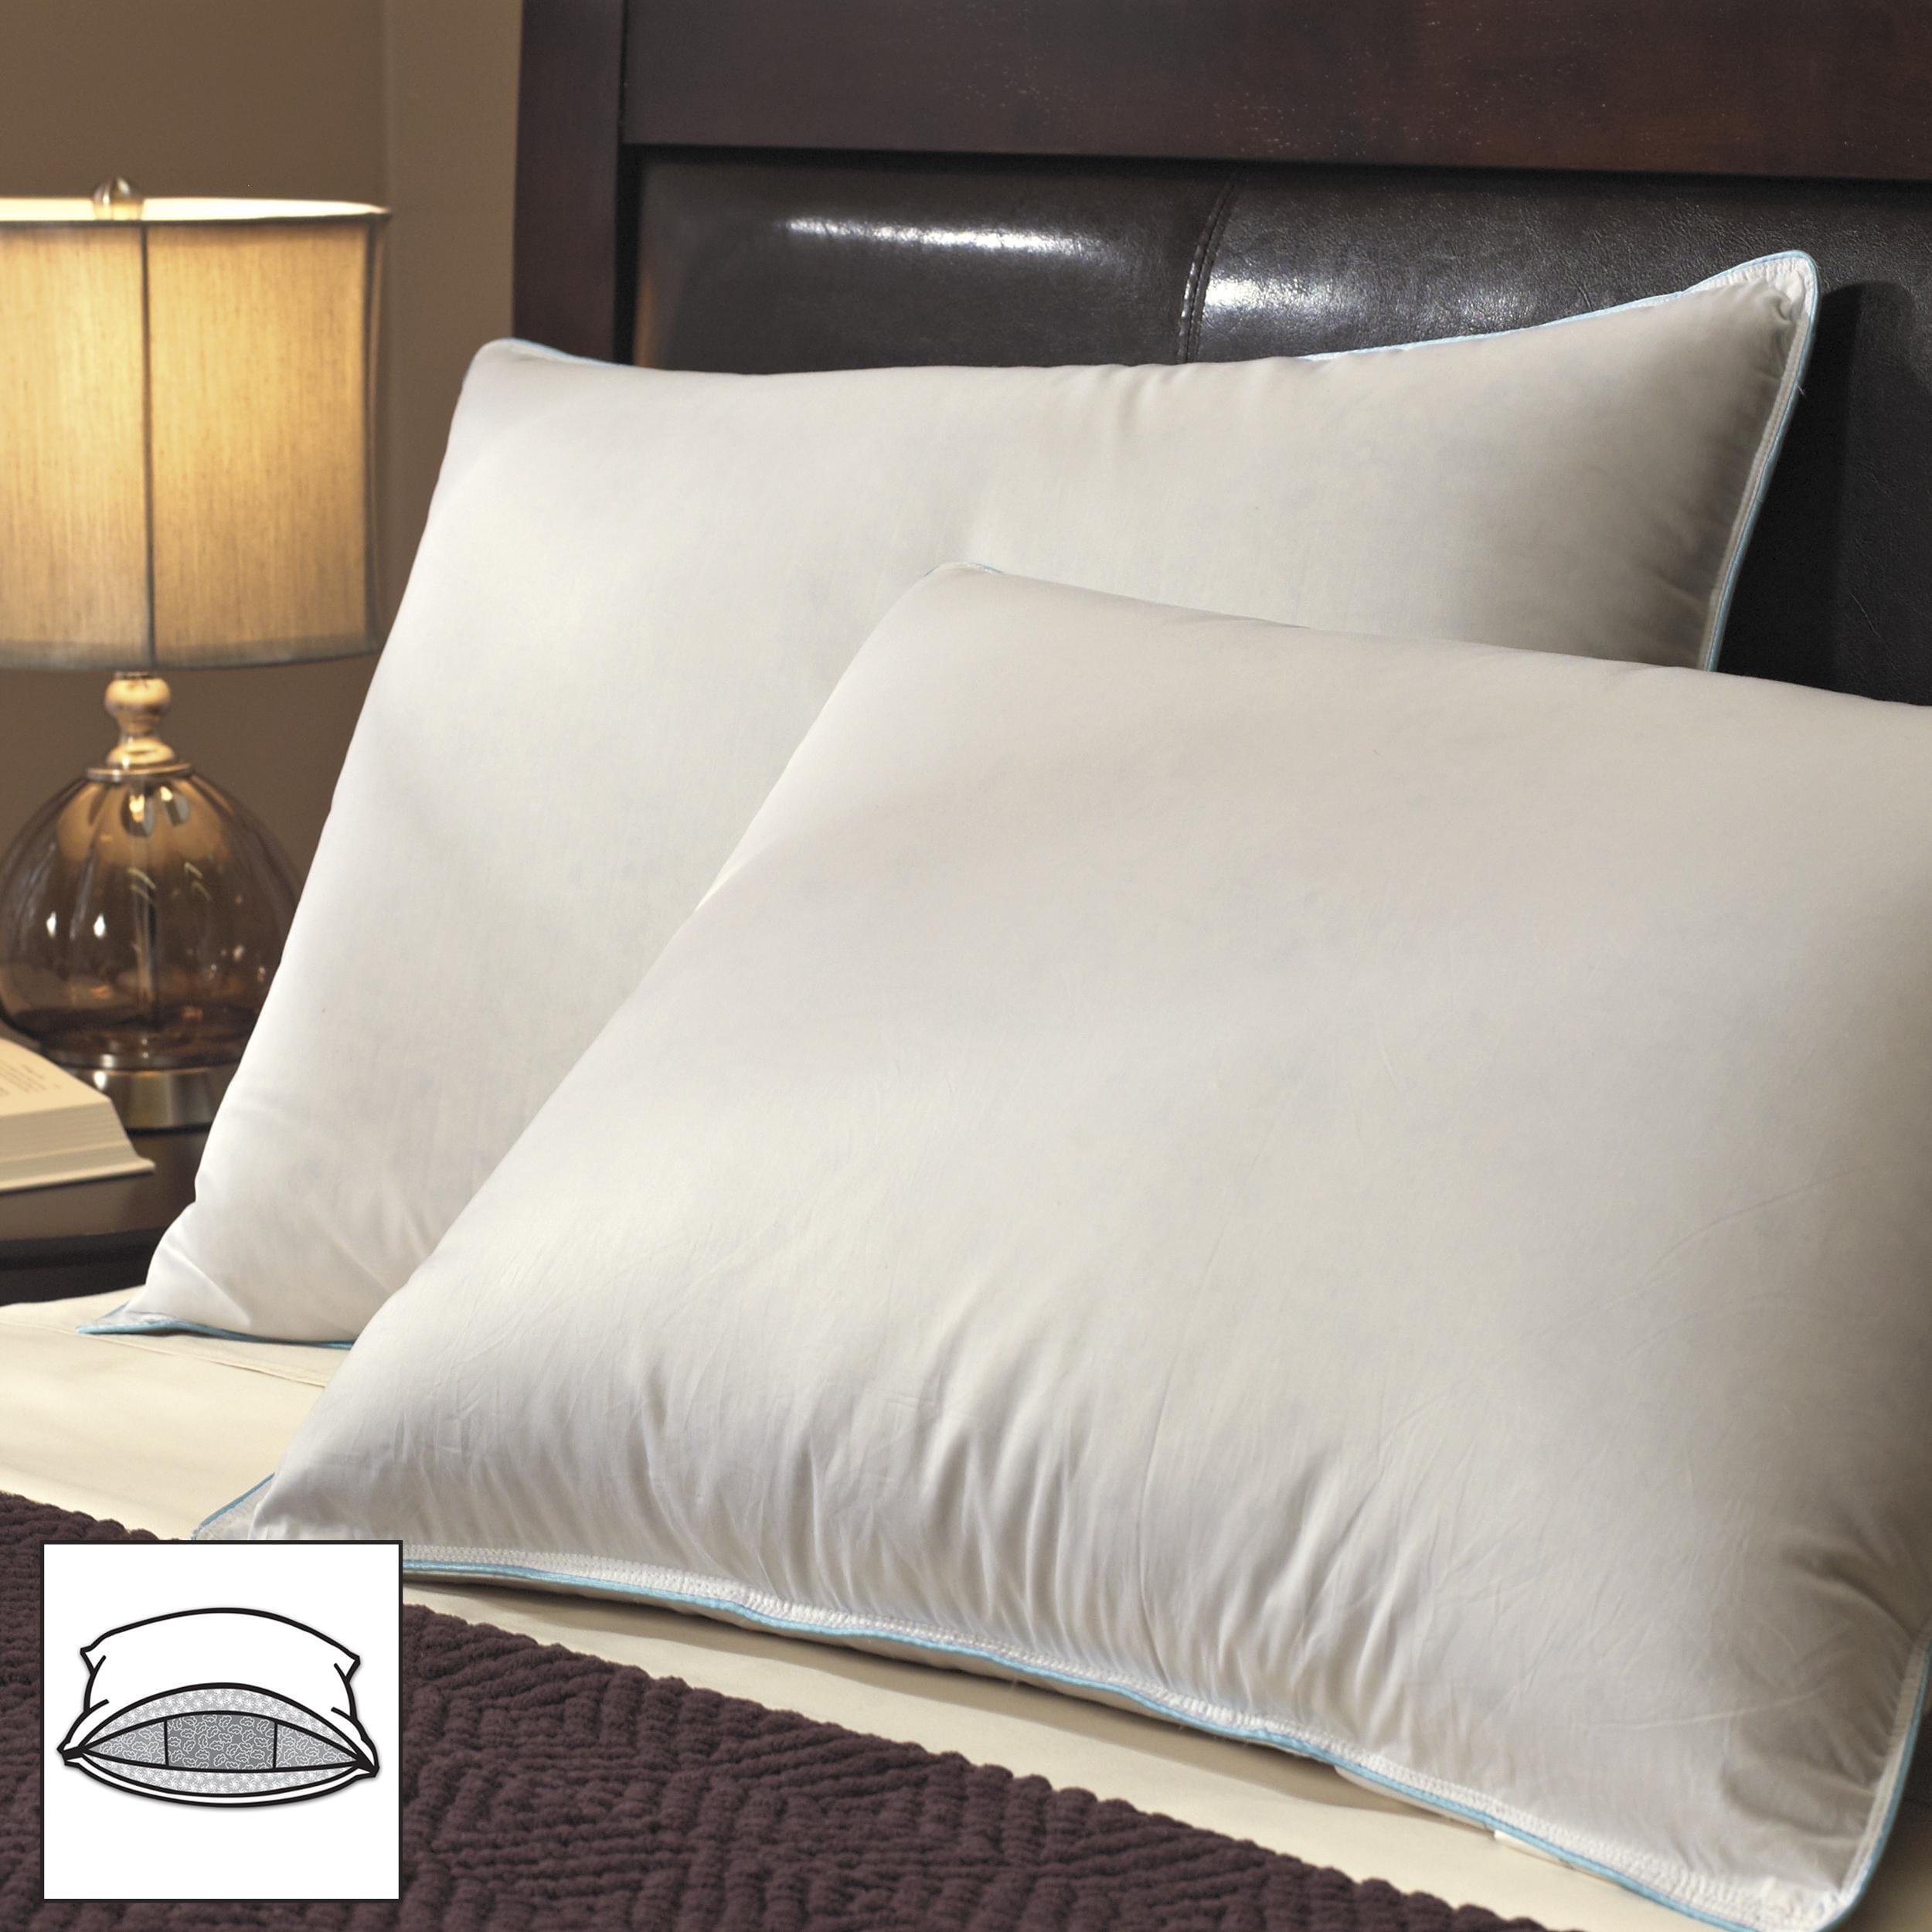 Famous Maker Premier 600 Fill Power Pyrenees Down Triple Chamber Pillows (Set of 2)